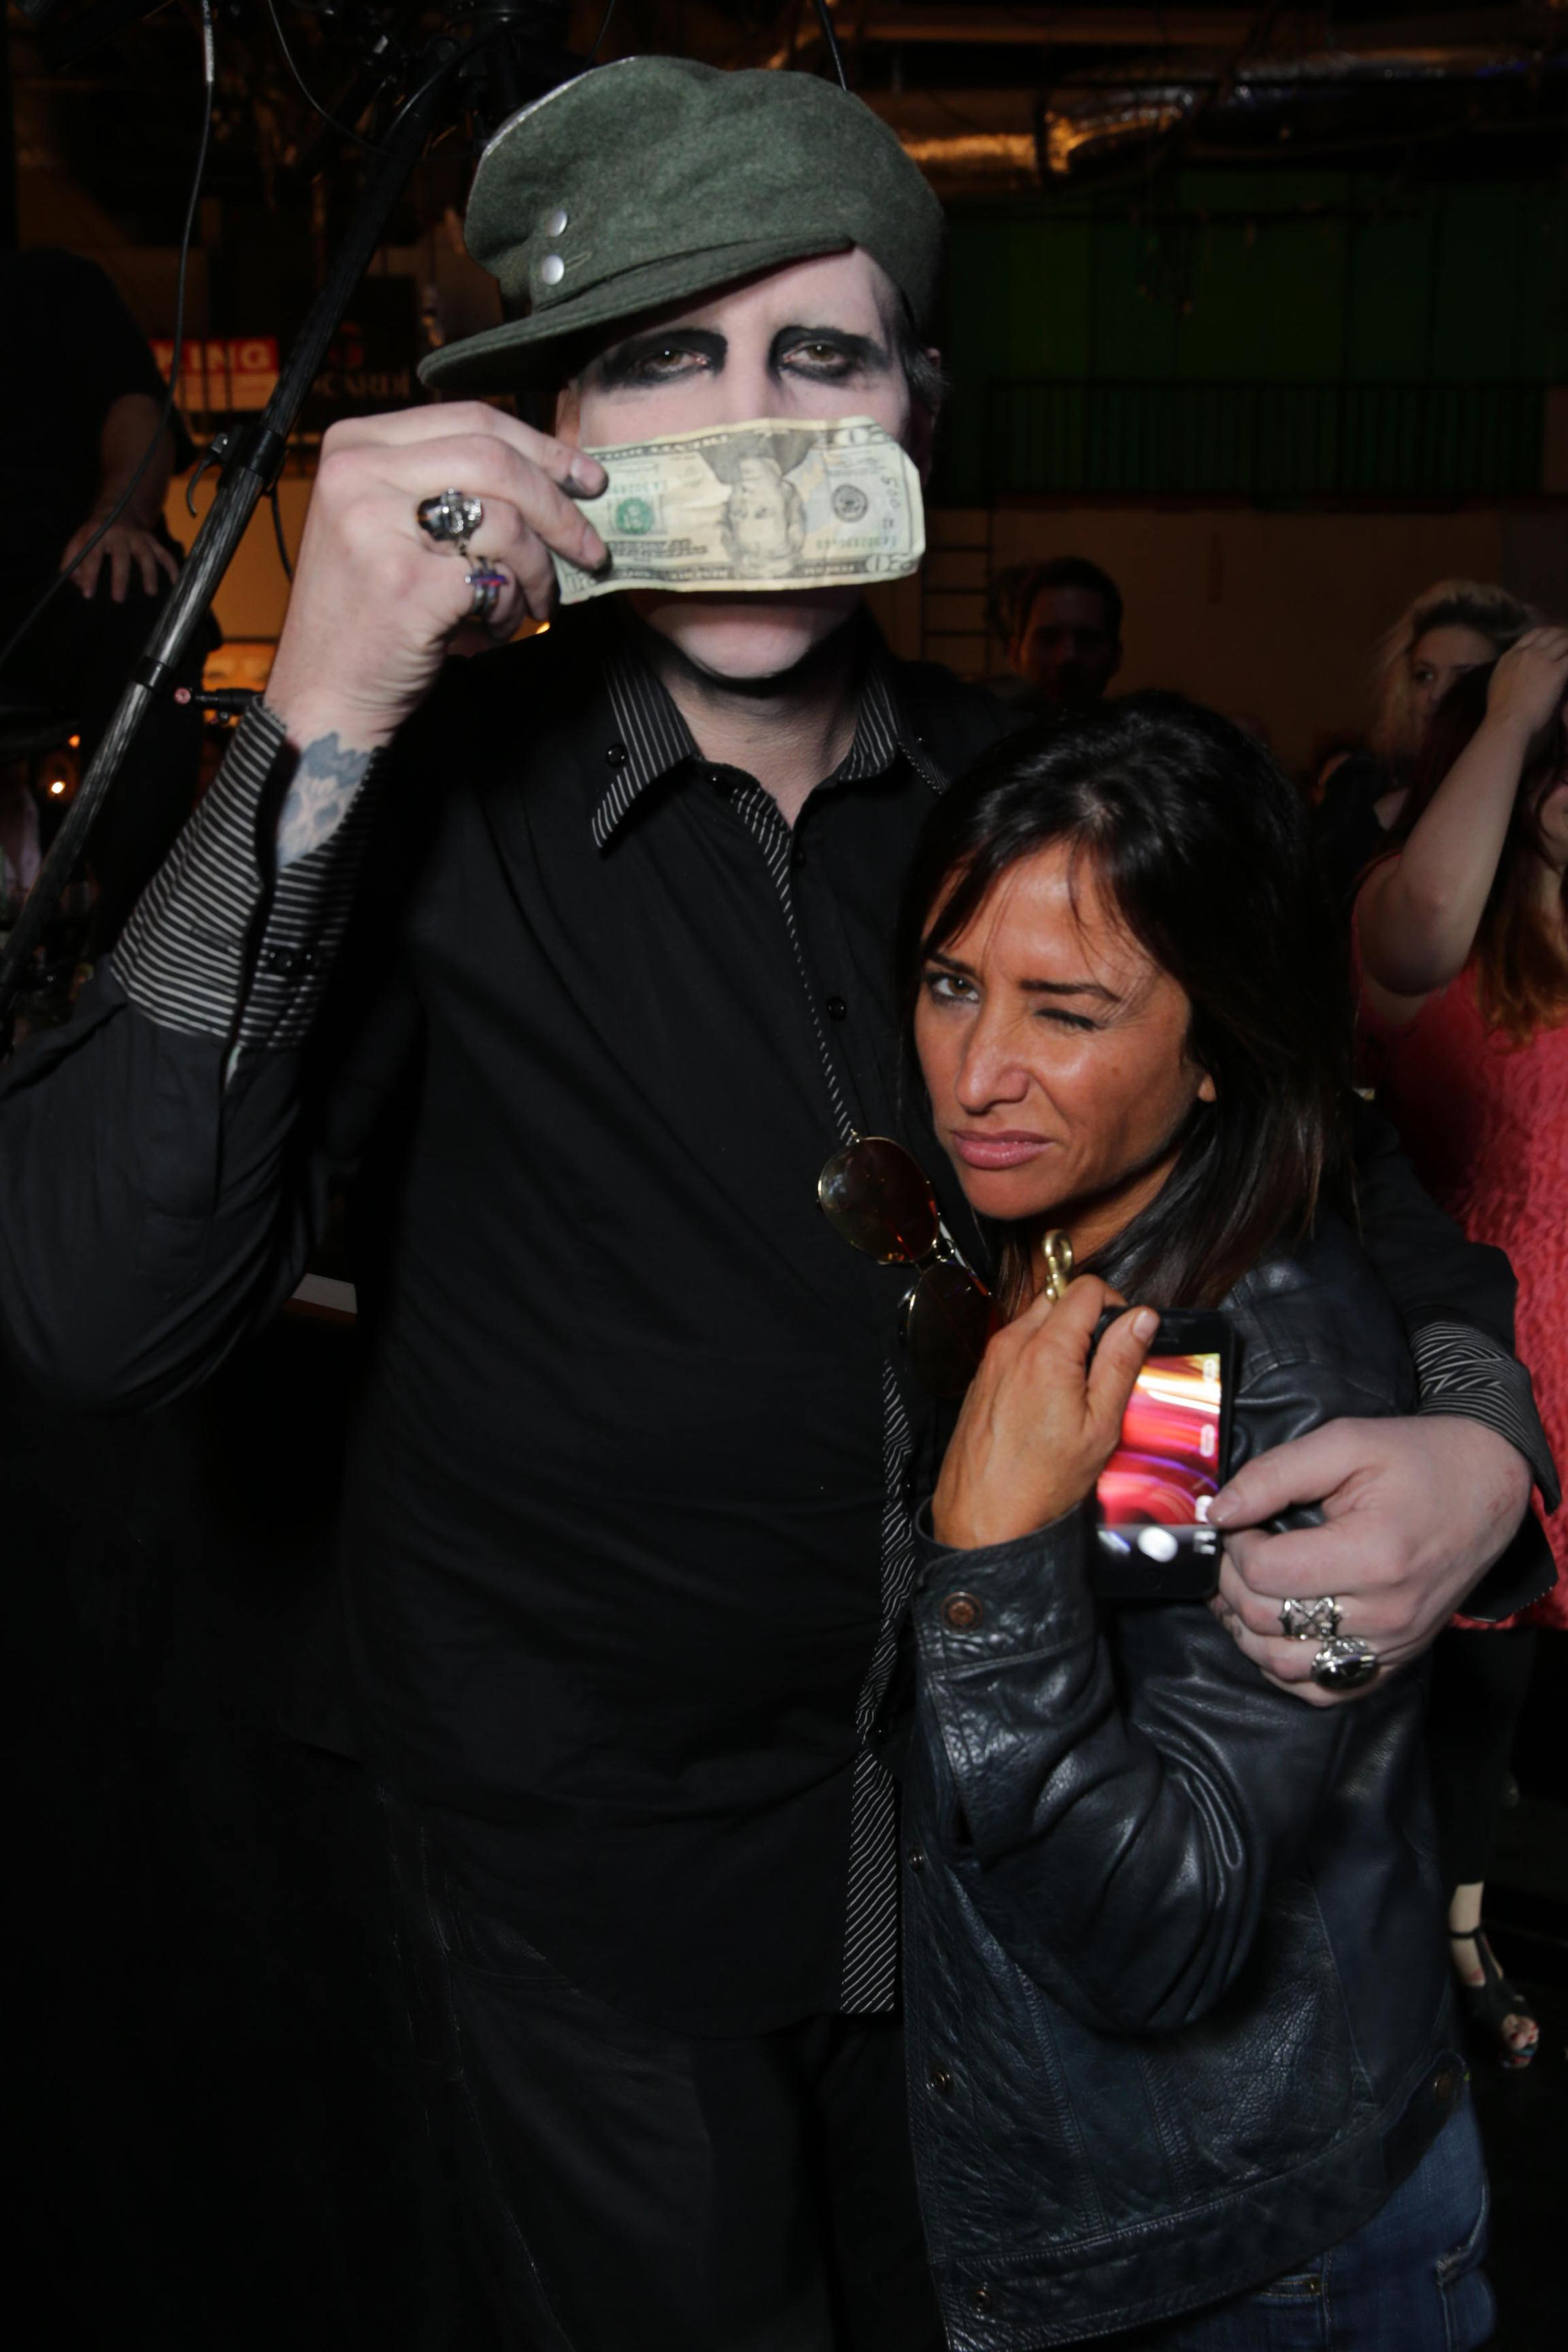 Californication - Season 7 - Wrap Party Photos (19)_FULL.jpg